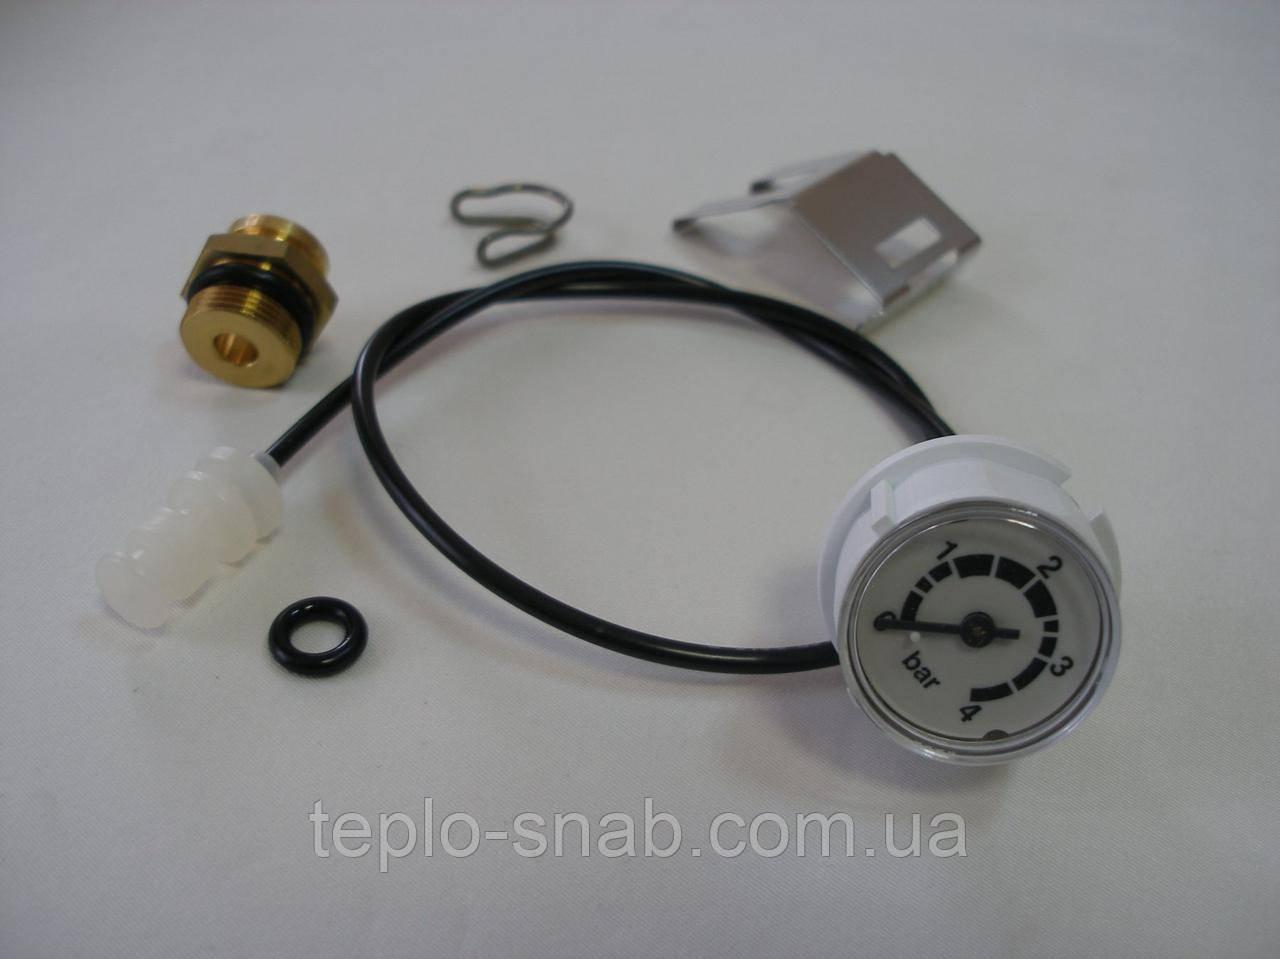 Манометр Junkers Bosch ZW23-1KE / AE 8738703601 (8707208009, 8707208019)